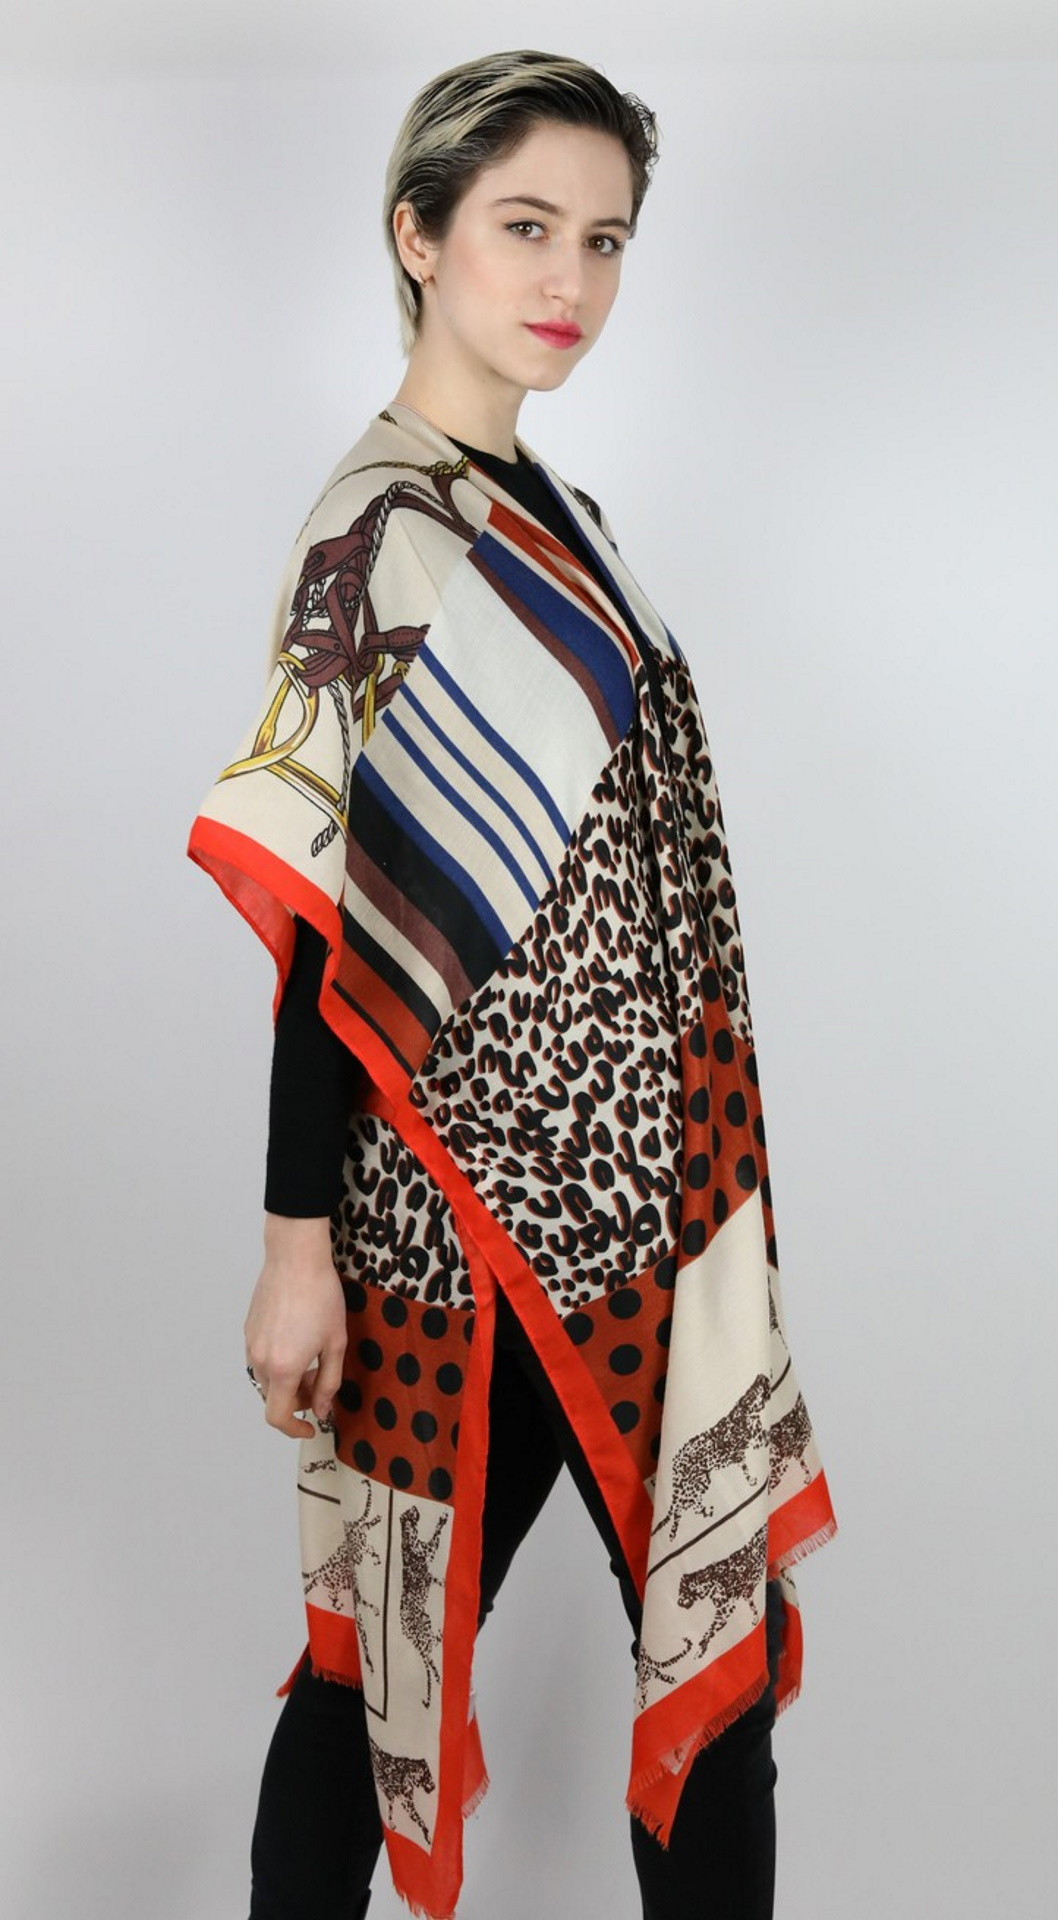 CLOTHES03 STOLA DONNA FOULARD CARDIGAN COPRISPALLE 3 1stAmerican elegante stola da donna foulard cardigan coprispalle